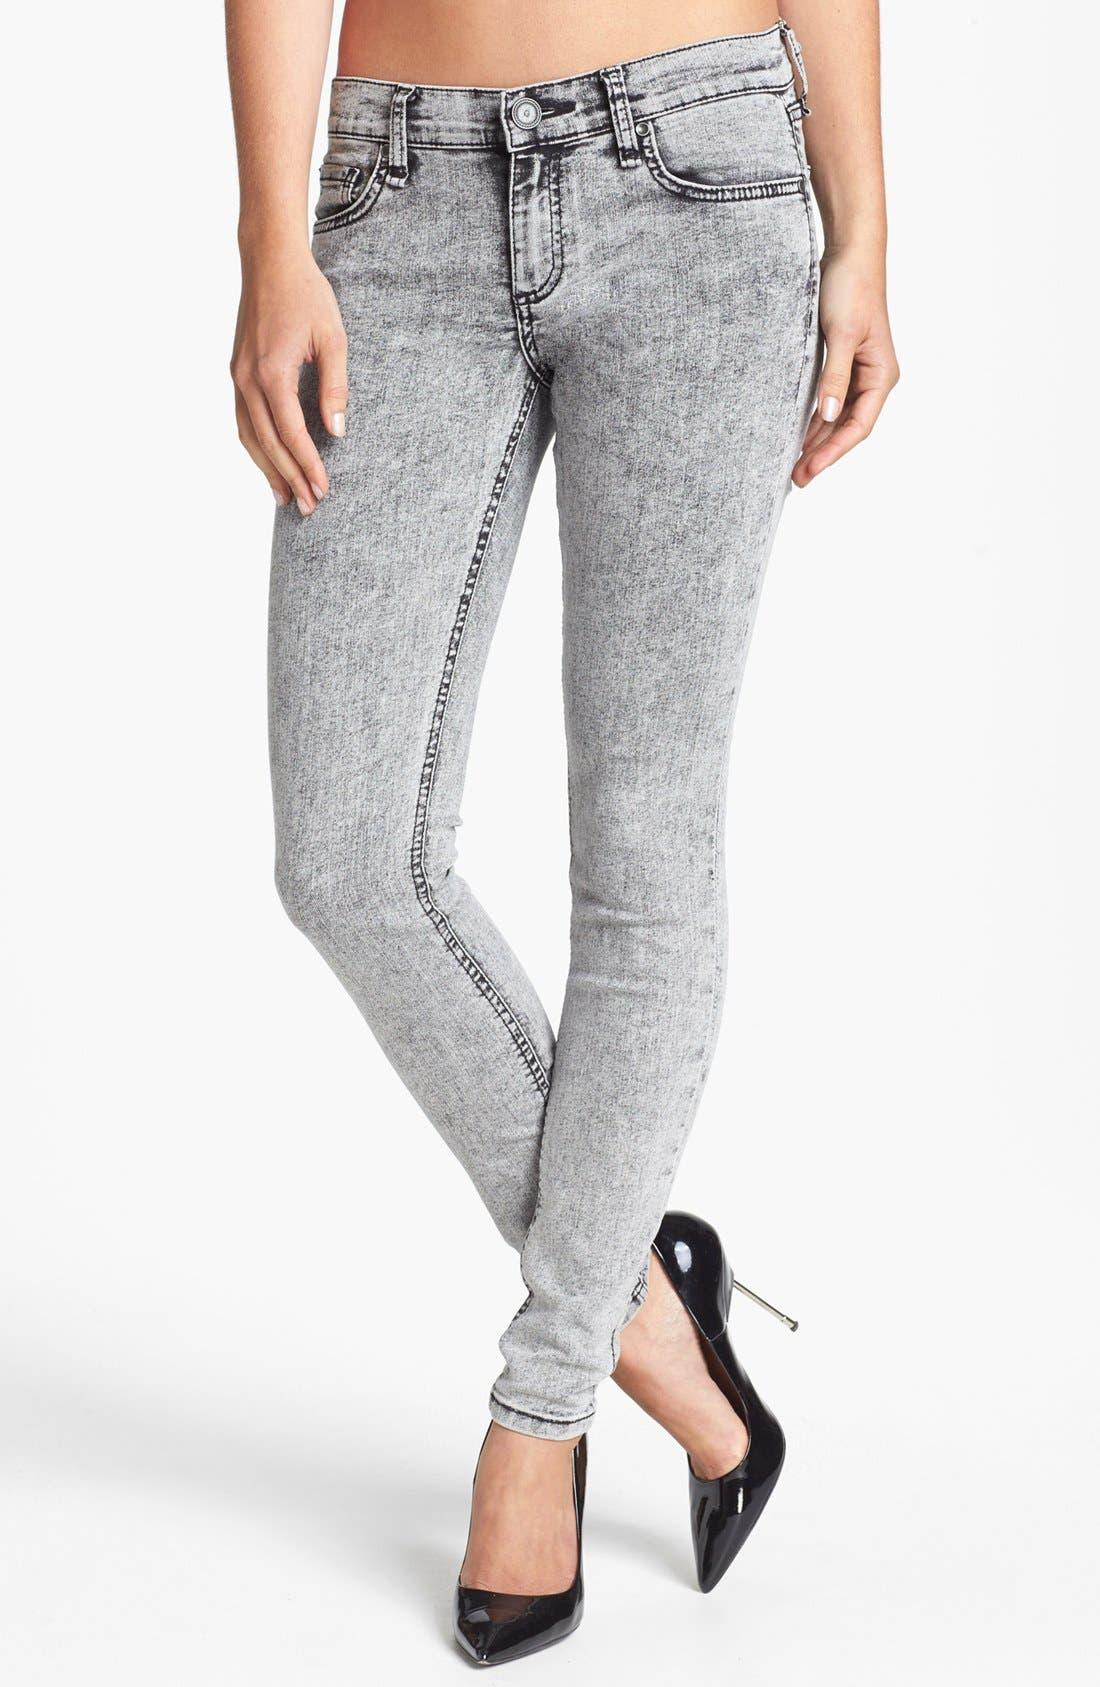 Alternate Image 1 Selected - edyson 'Sloan' Acid Wash Skinny Jeans (Grey Maven)